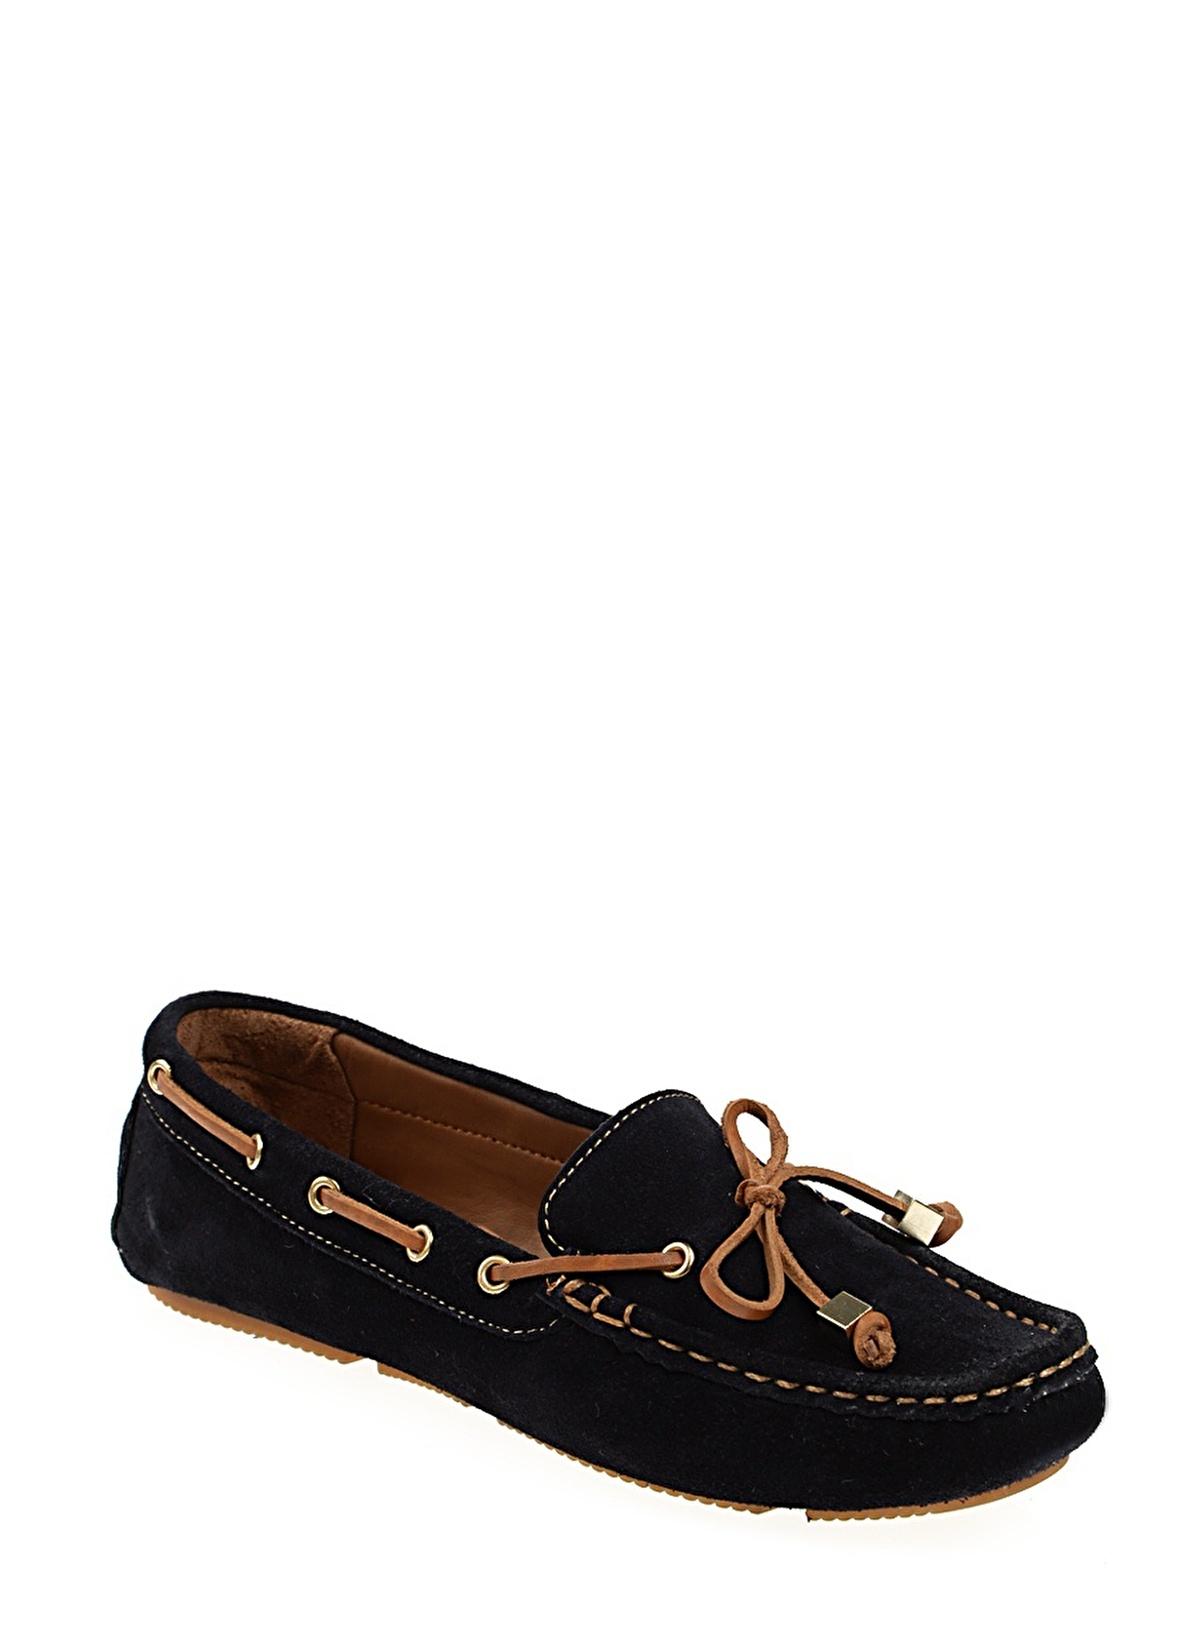 Divarese Ayakkabı 5015259-k-loafer – 109.0 TL